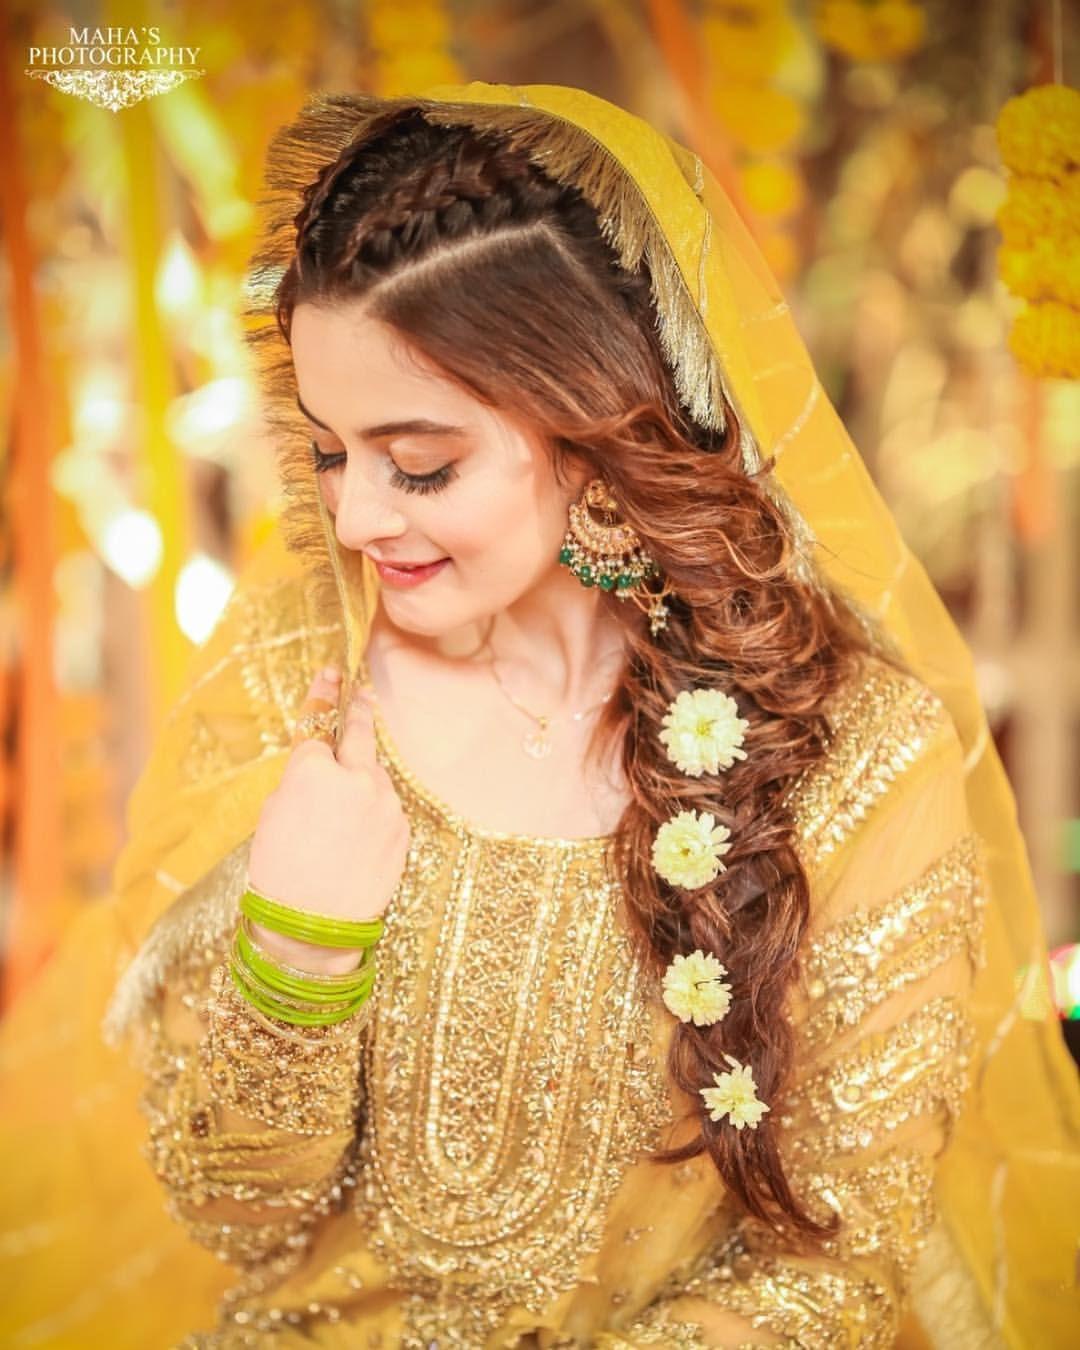 Wedding Hairstyles Instagram: Maha Wajahat Khan (@mahasphotographyofficial) • Instagram